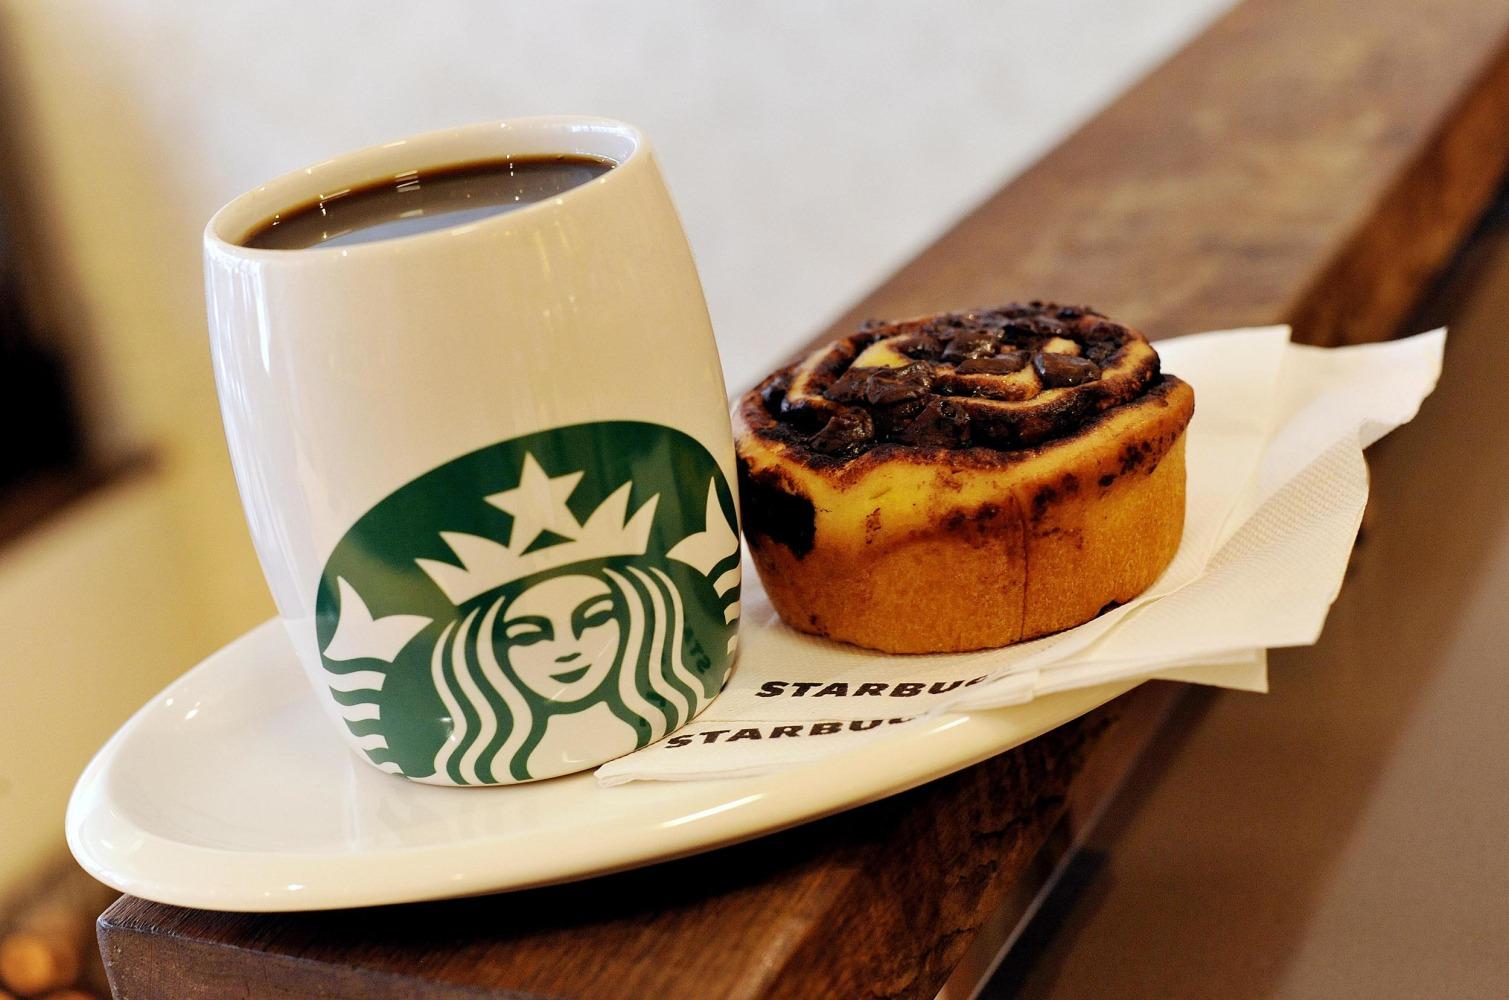 New Food At Starbucks